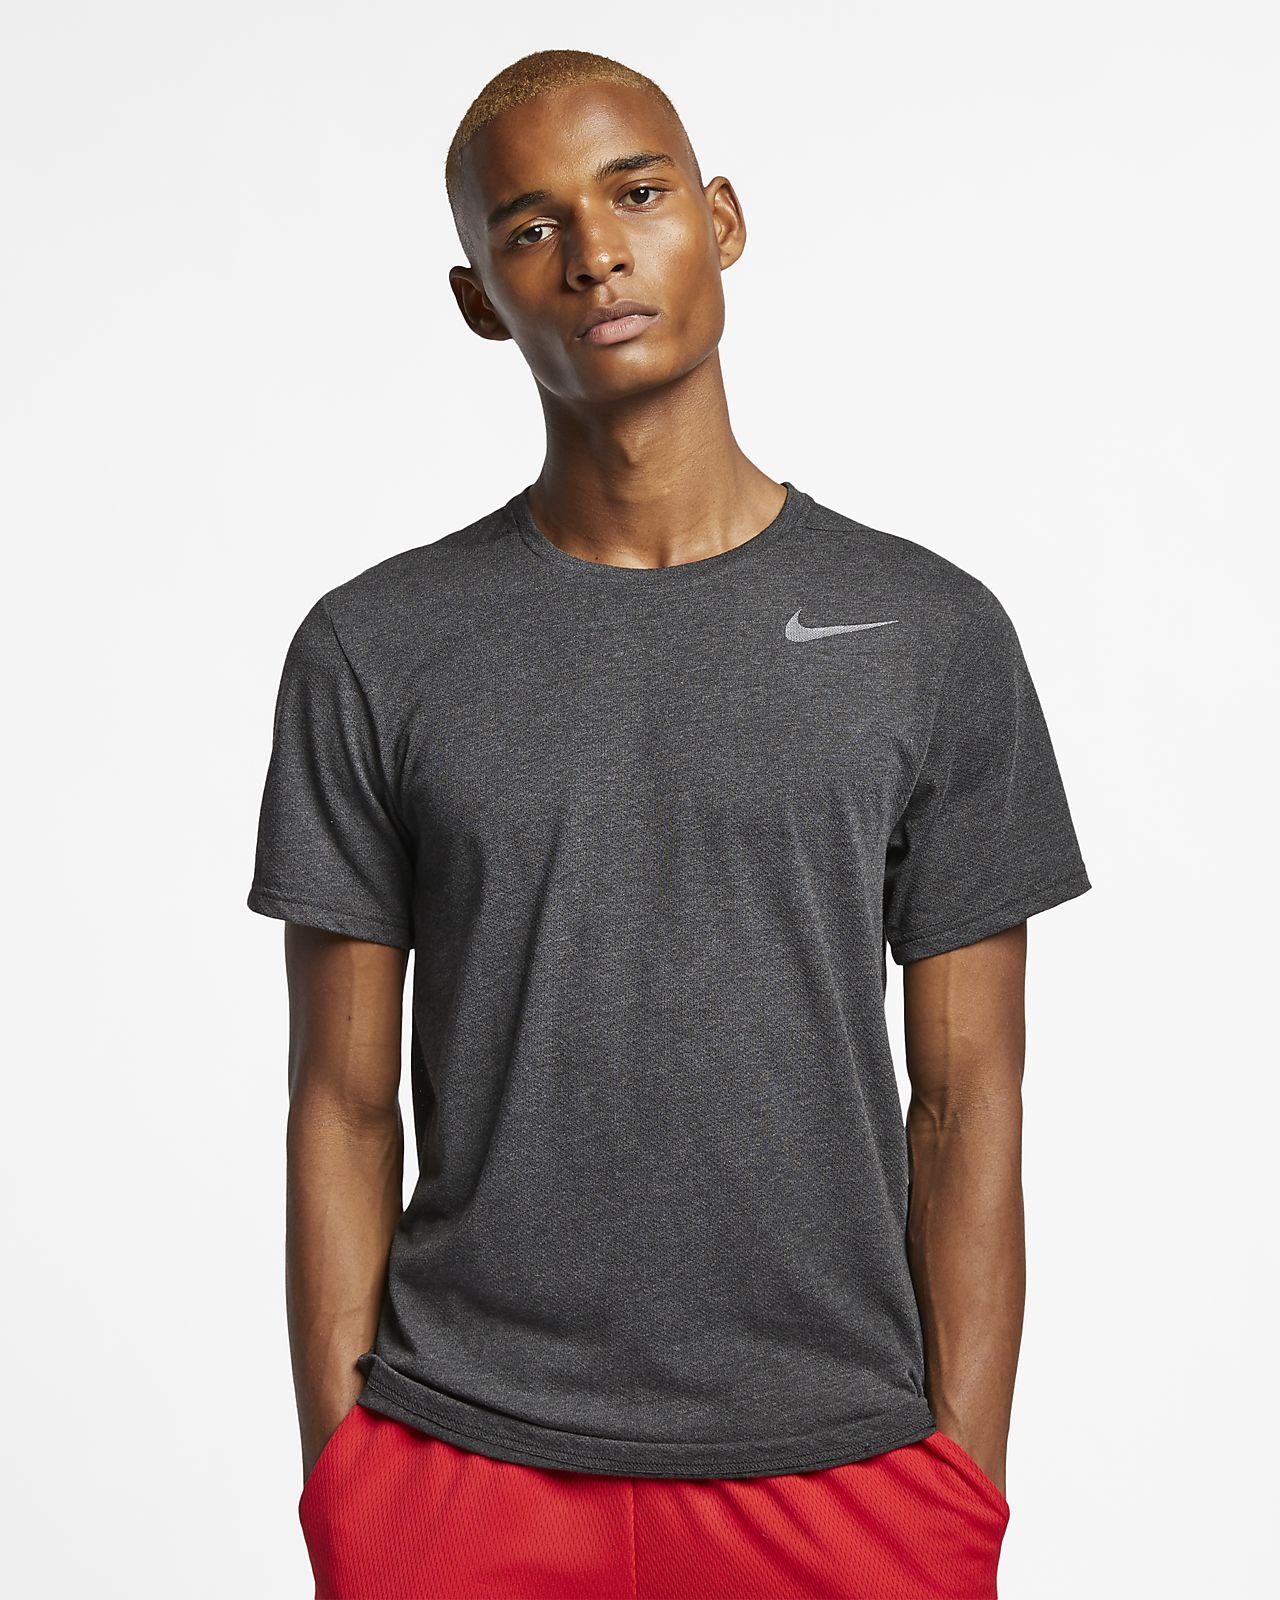 Koszulka chłopięca Nike Dri Fit Training Short Sleeve Czarny